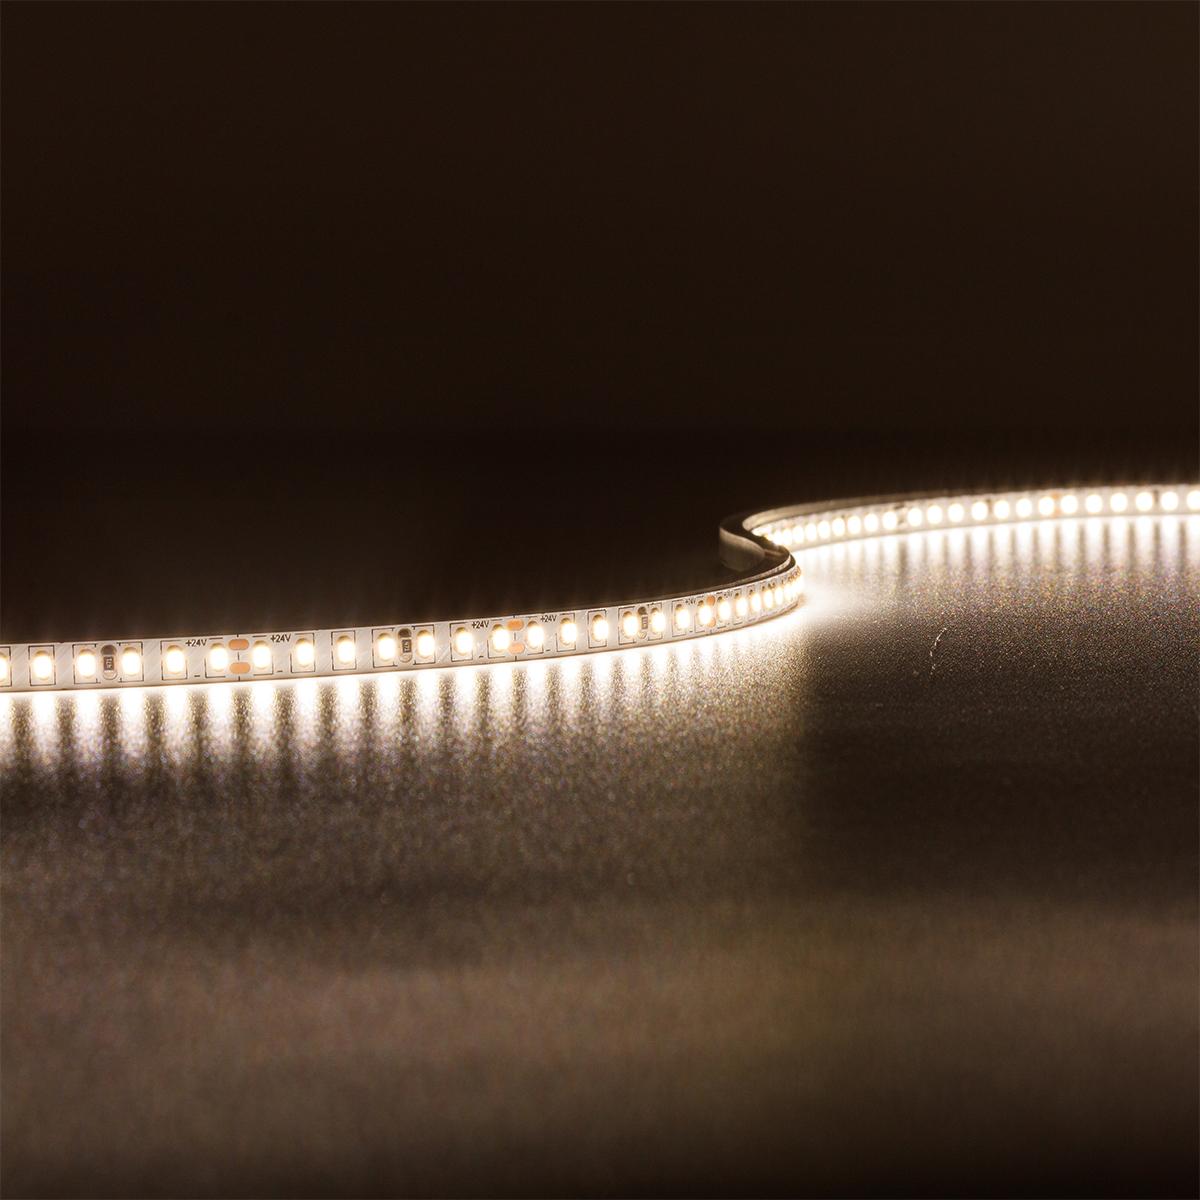 Strip Neutralweiß 24V LED Streifen 5M 8W/m 224LED/m 5mm IP20 4000K